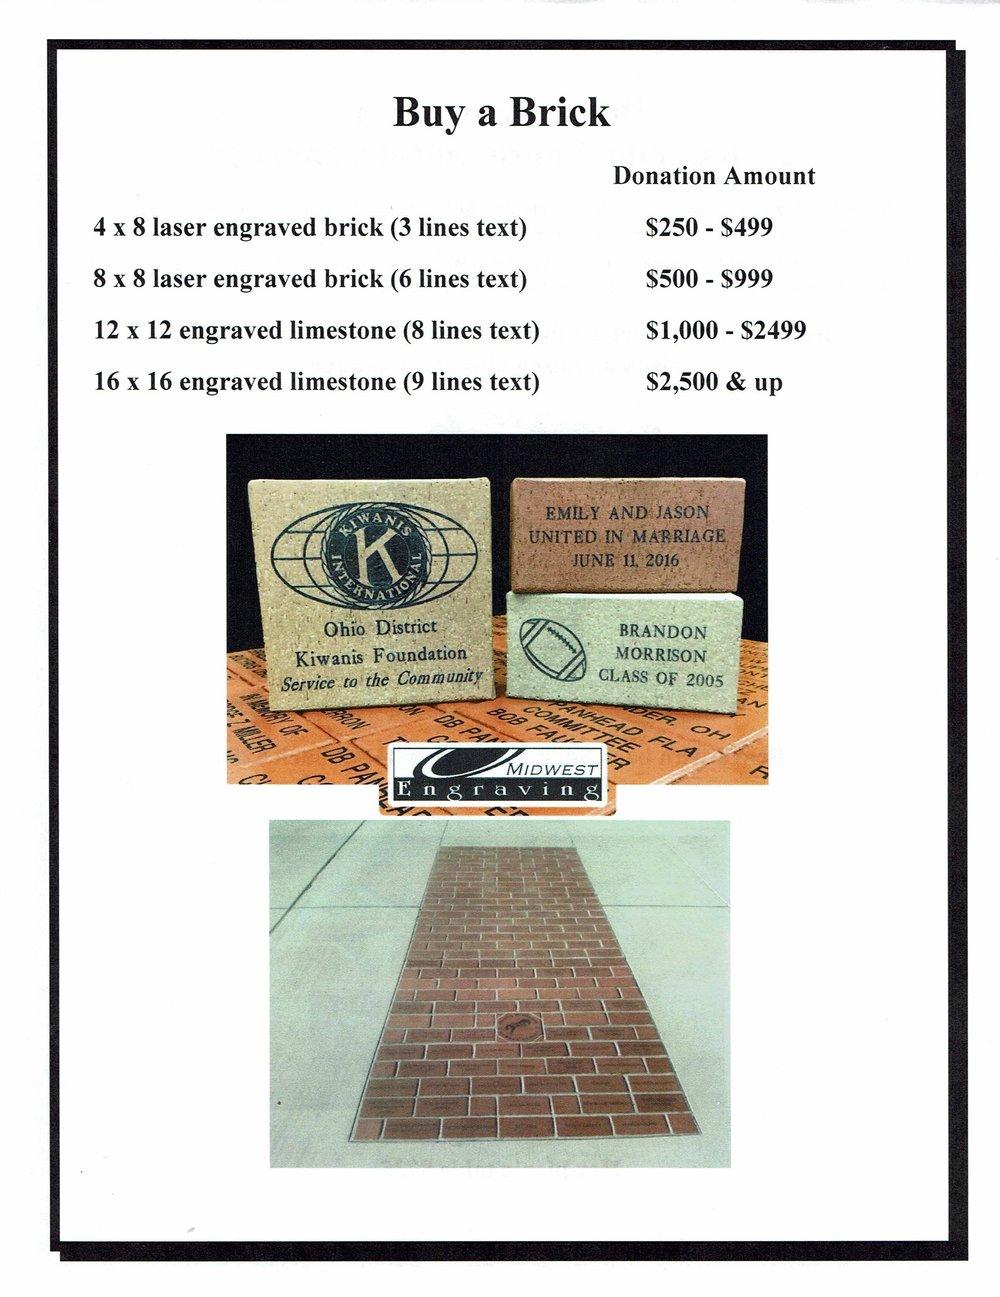 Brick2_000002.jpg